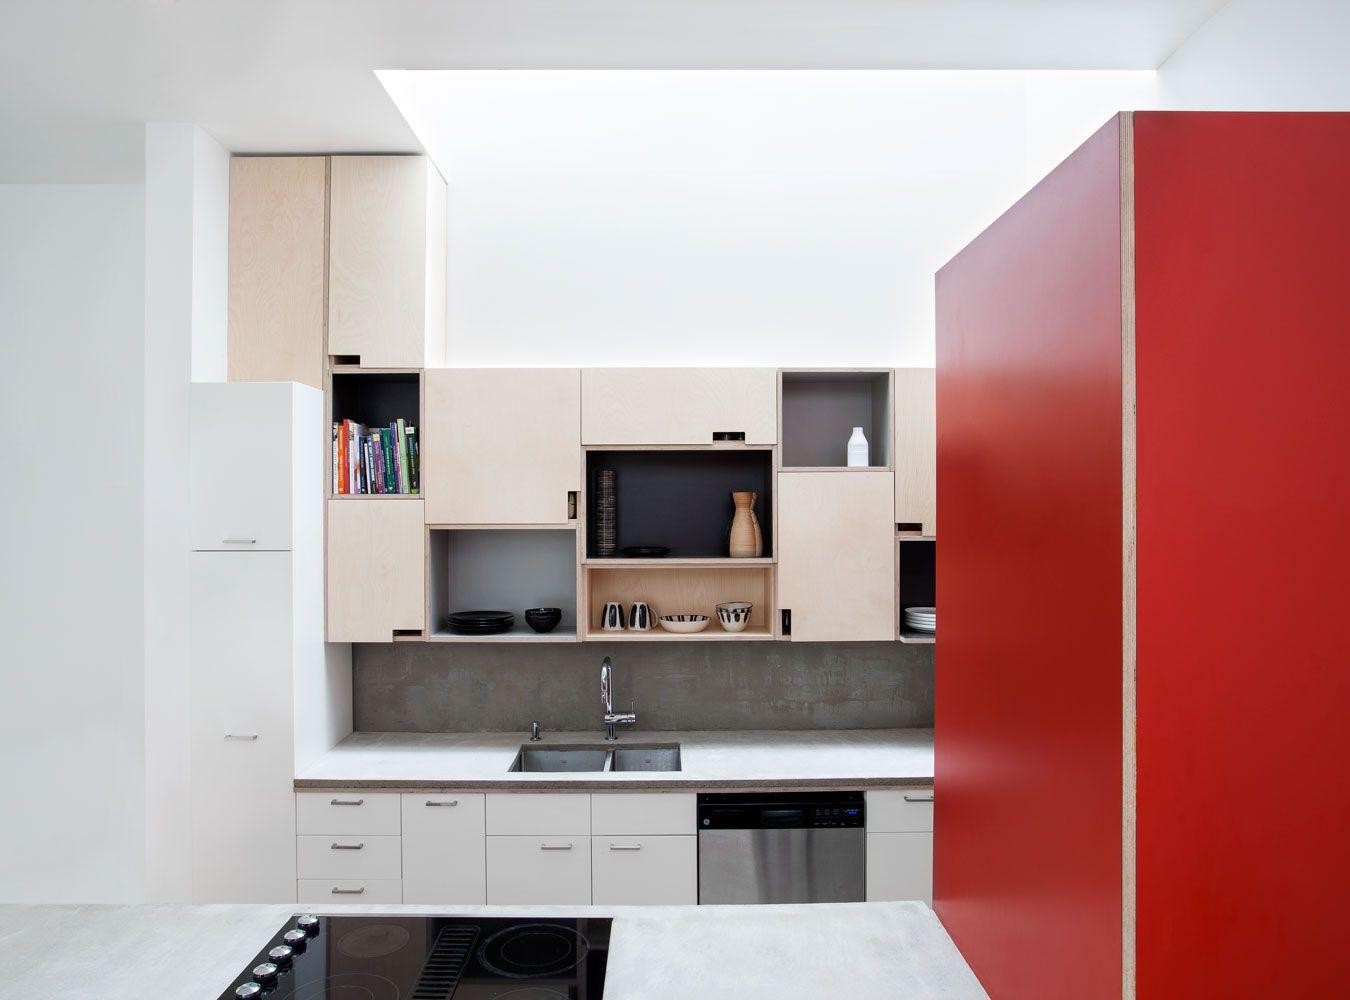 Pin by alla tzecher on kitchen pinterest architecture design and